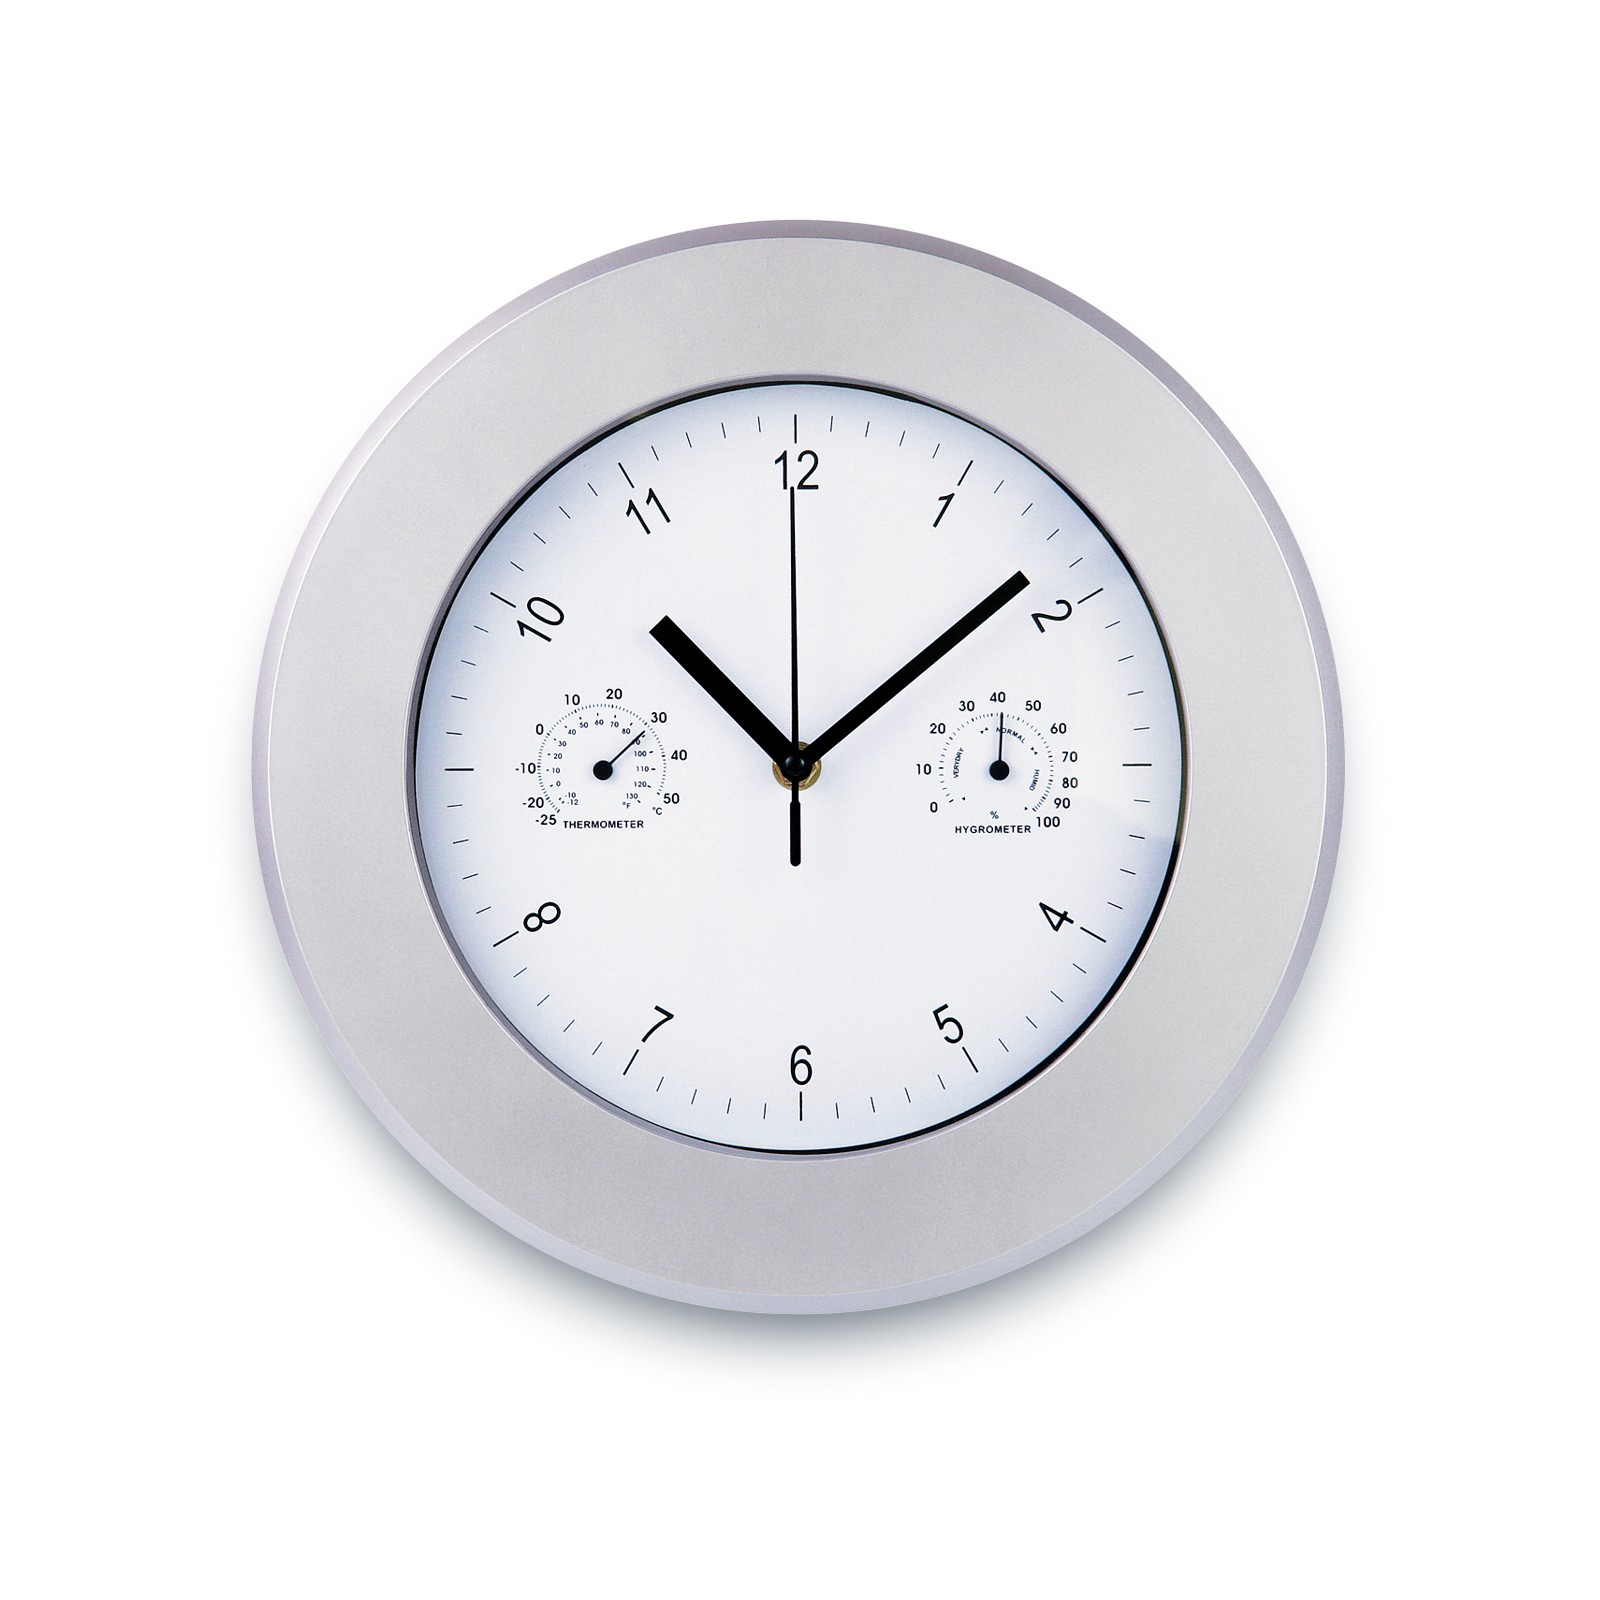 Acd - Ρολόι τοίχου με ενσωματωμένο θερμόμετρο   υγρόμετρο 022011 27330c6ee4a